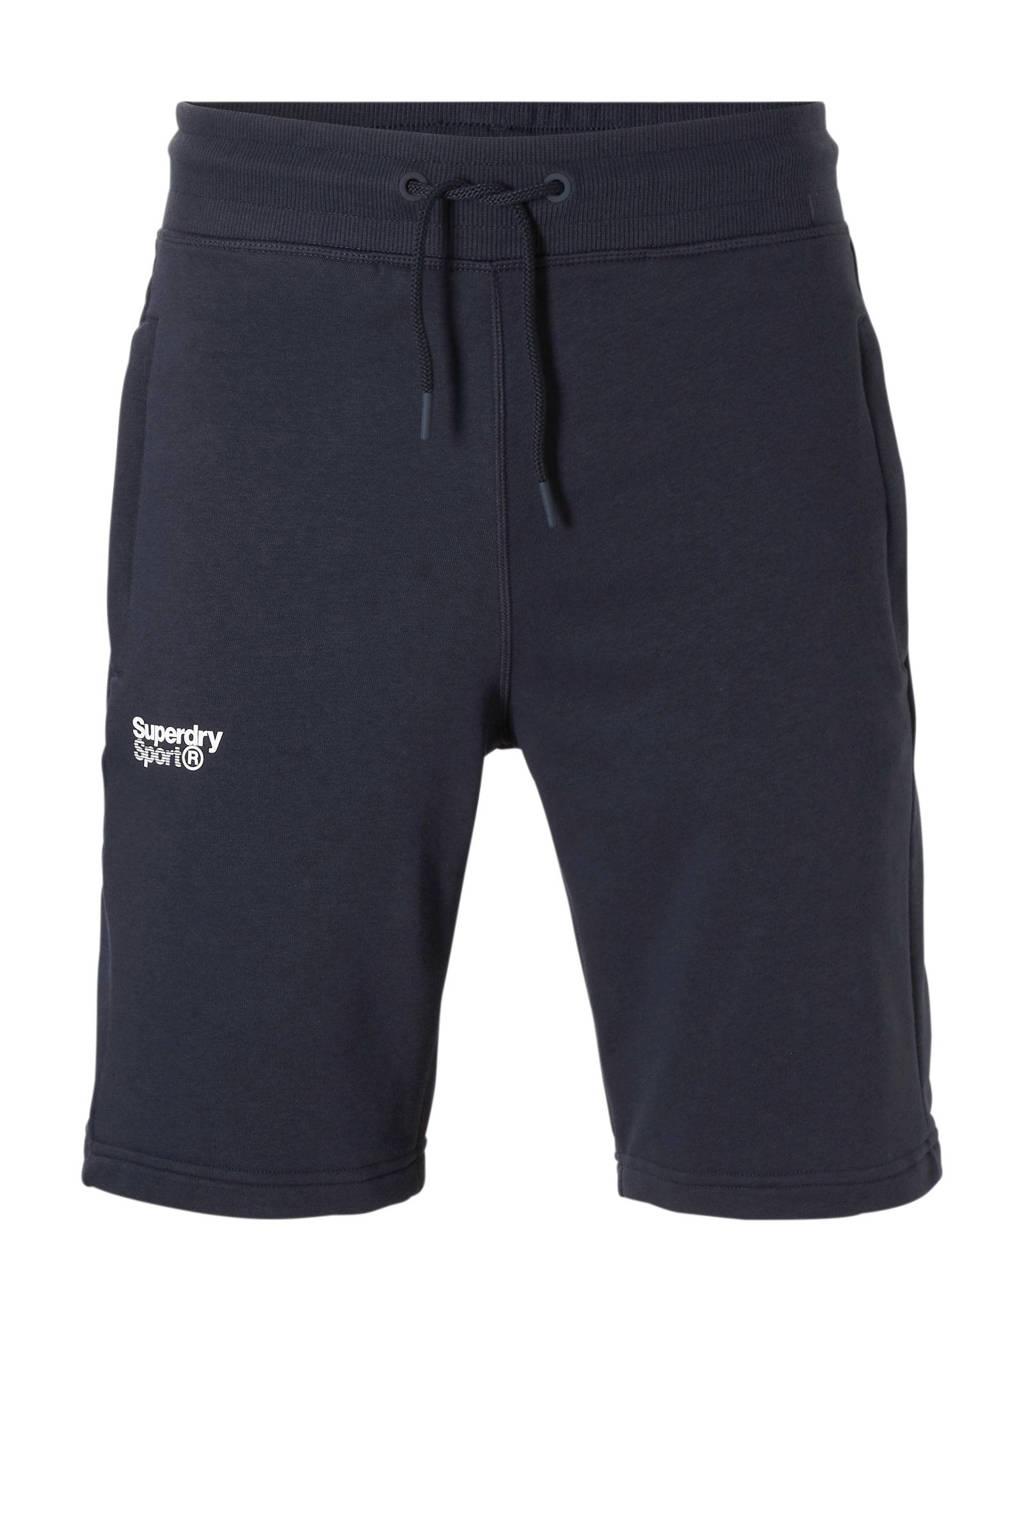 Superdry Sport   short, Donkerblauw